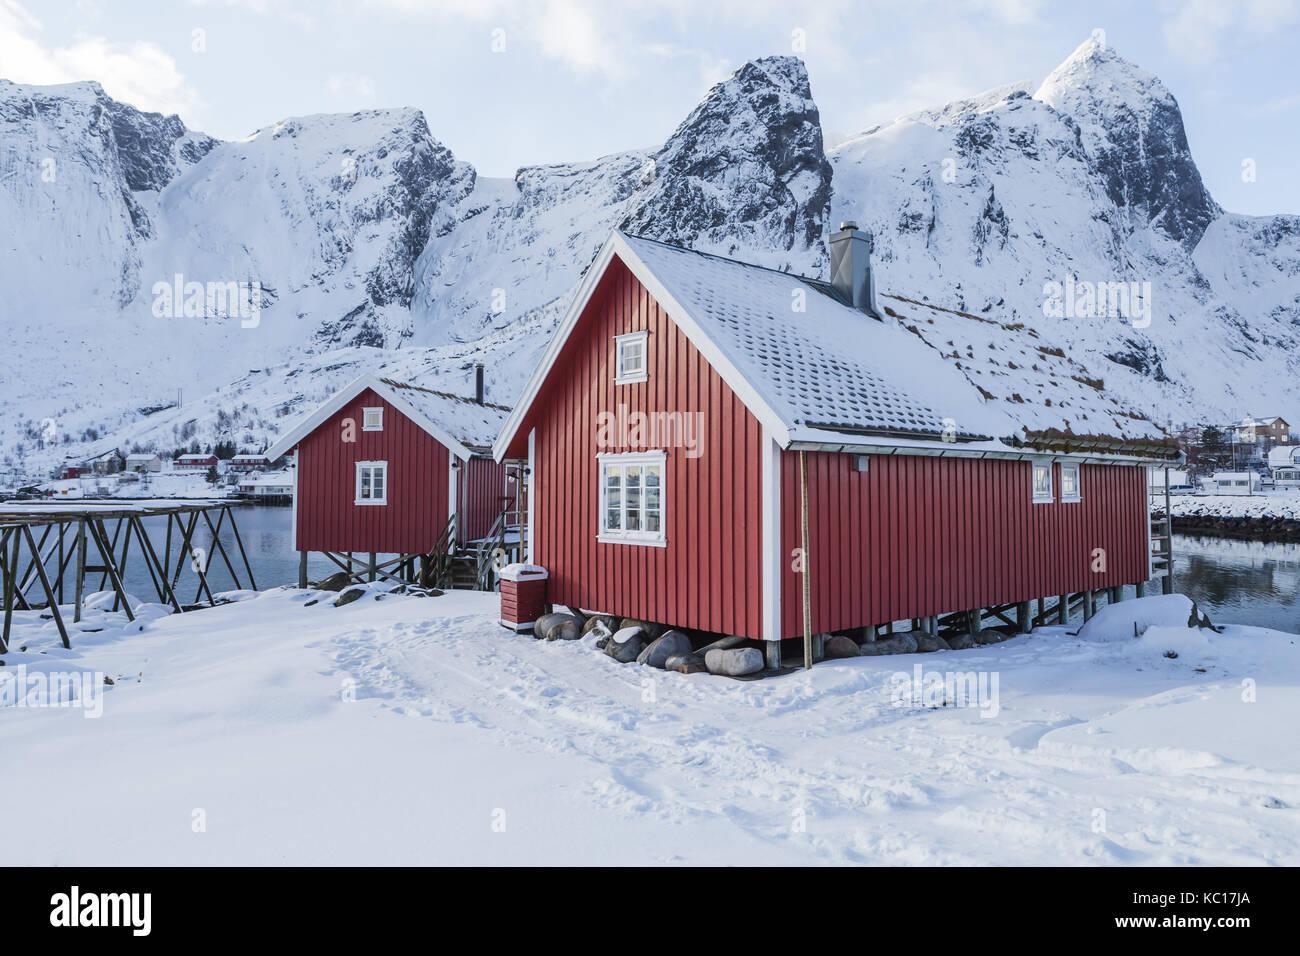 Typical houses of fishermen called Rorbu, Lofoten islands, Norway Stock Photo